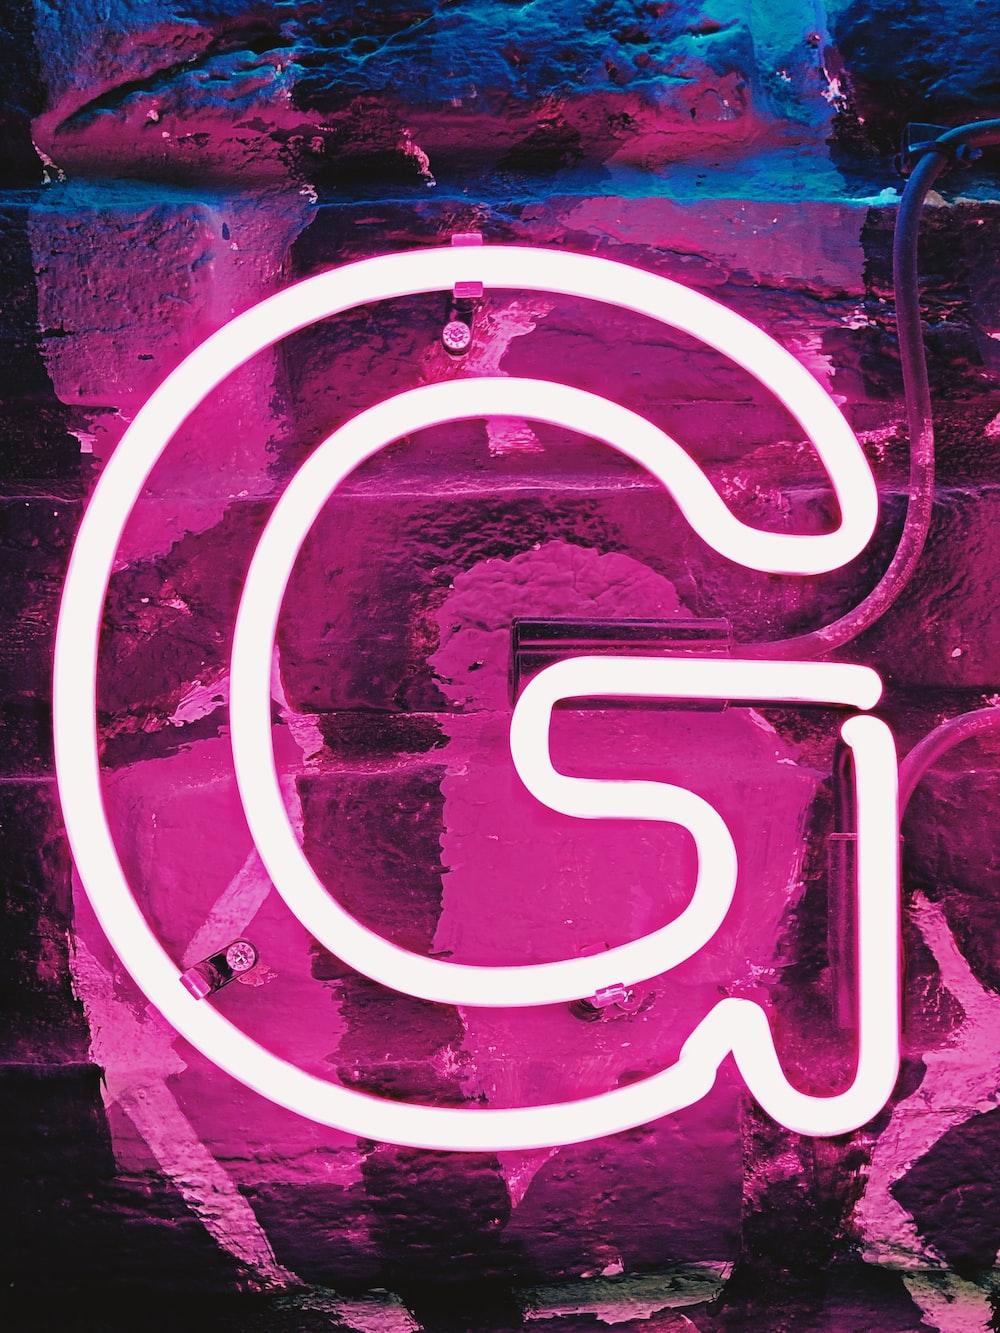 white G neon sign